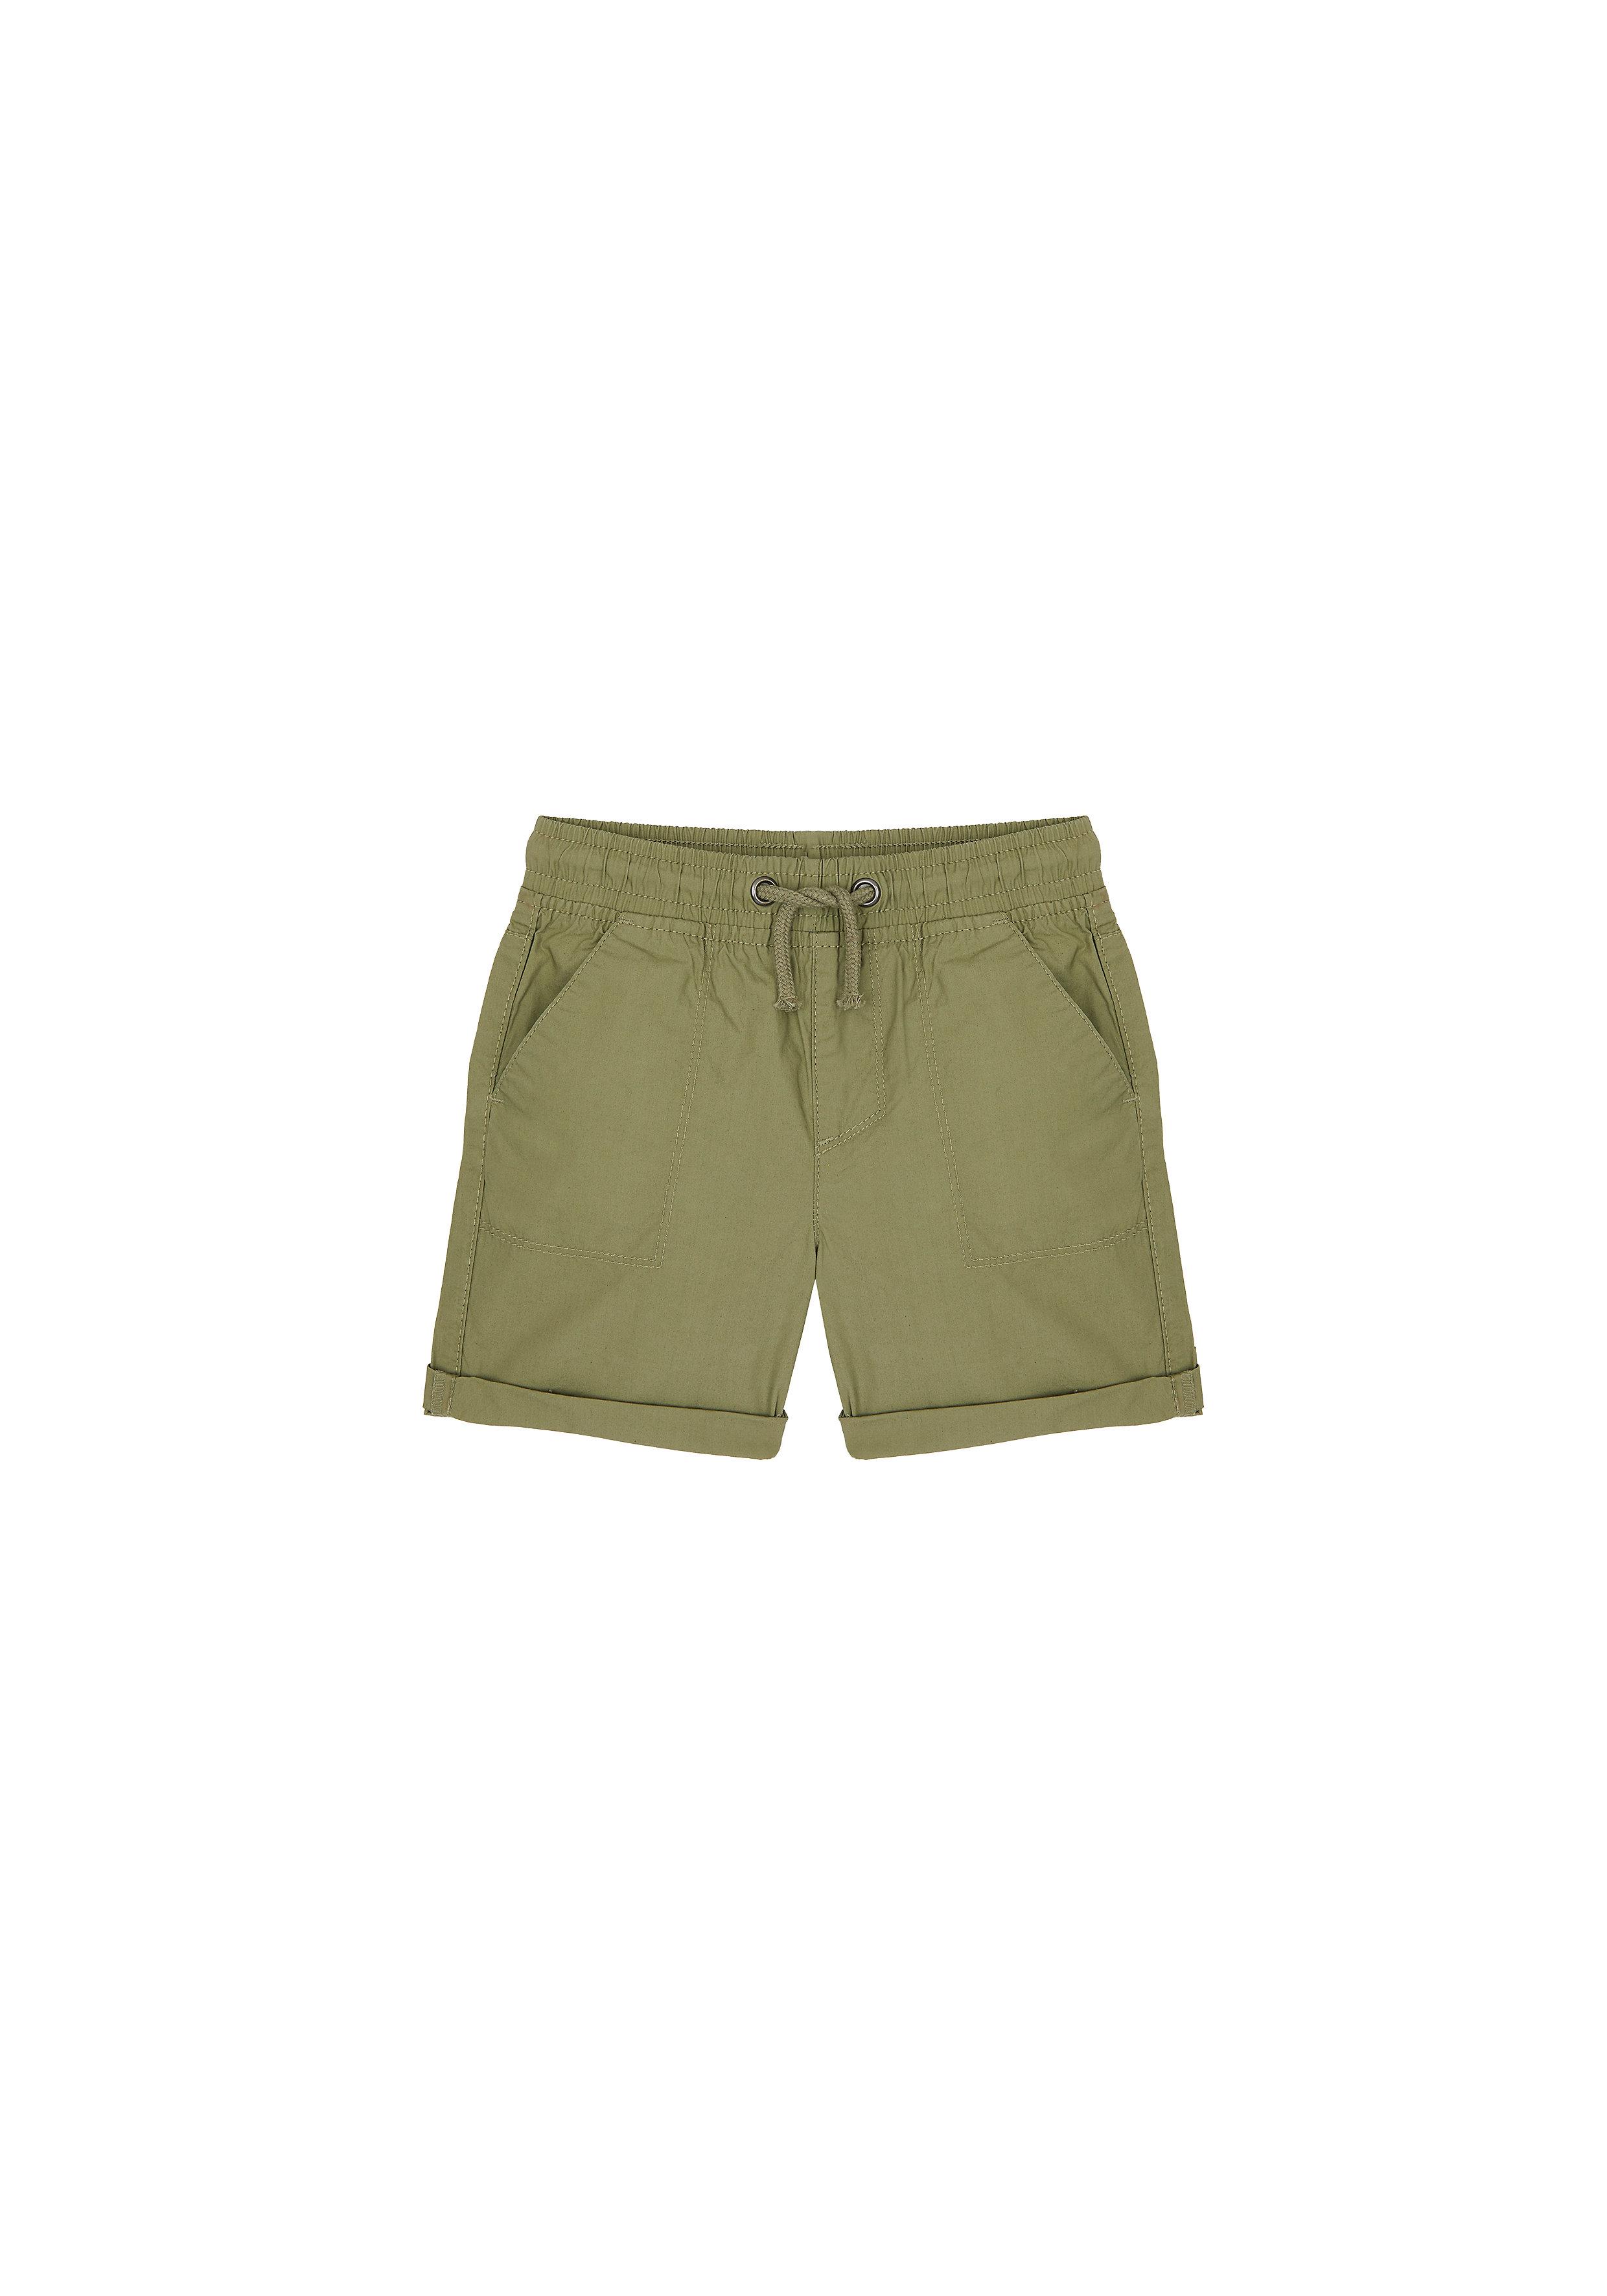 Mothercare | Boys Woven Shorts Rolled Up Hem - Khaki